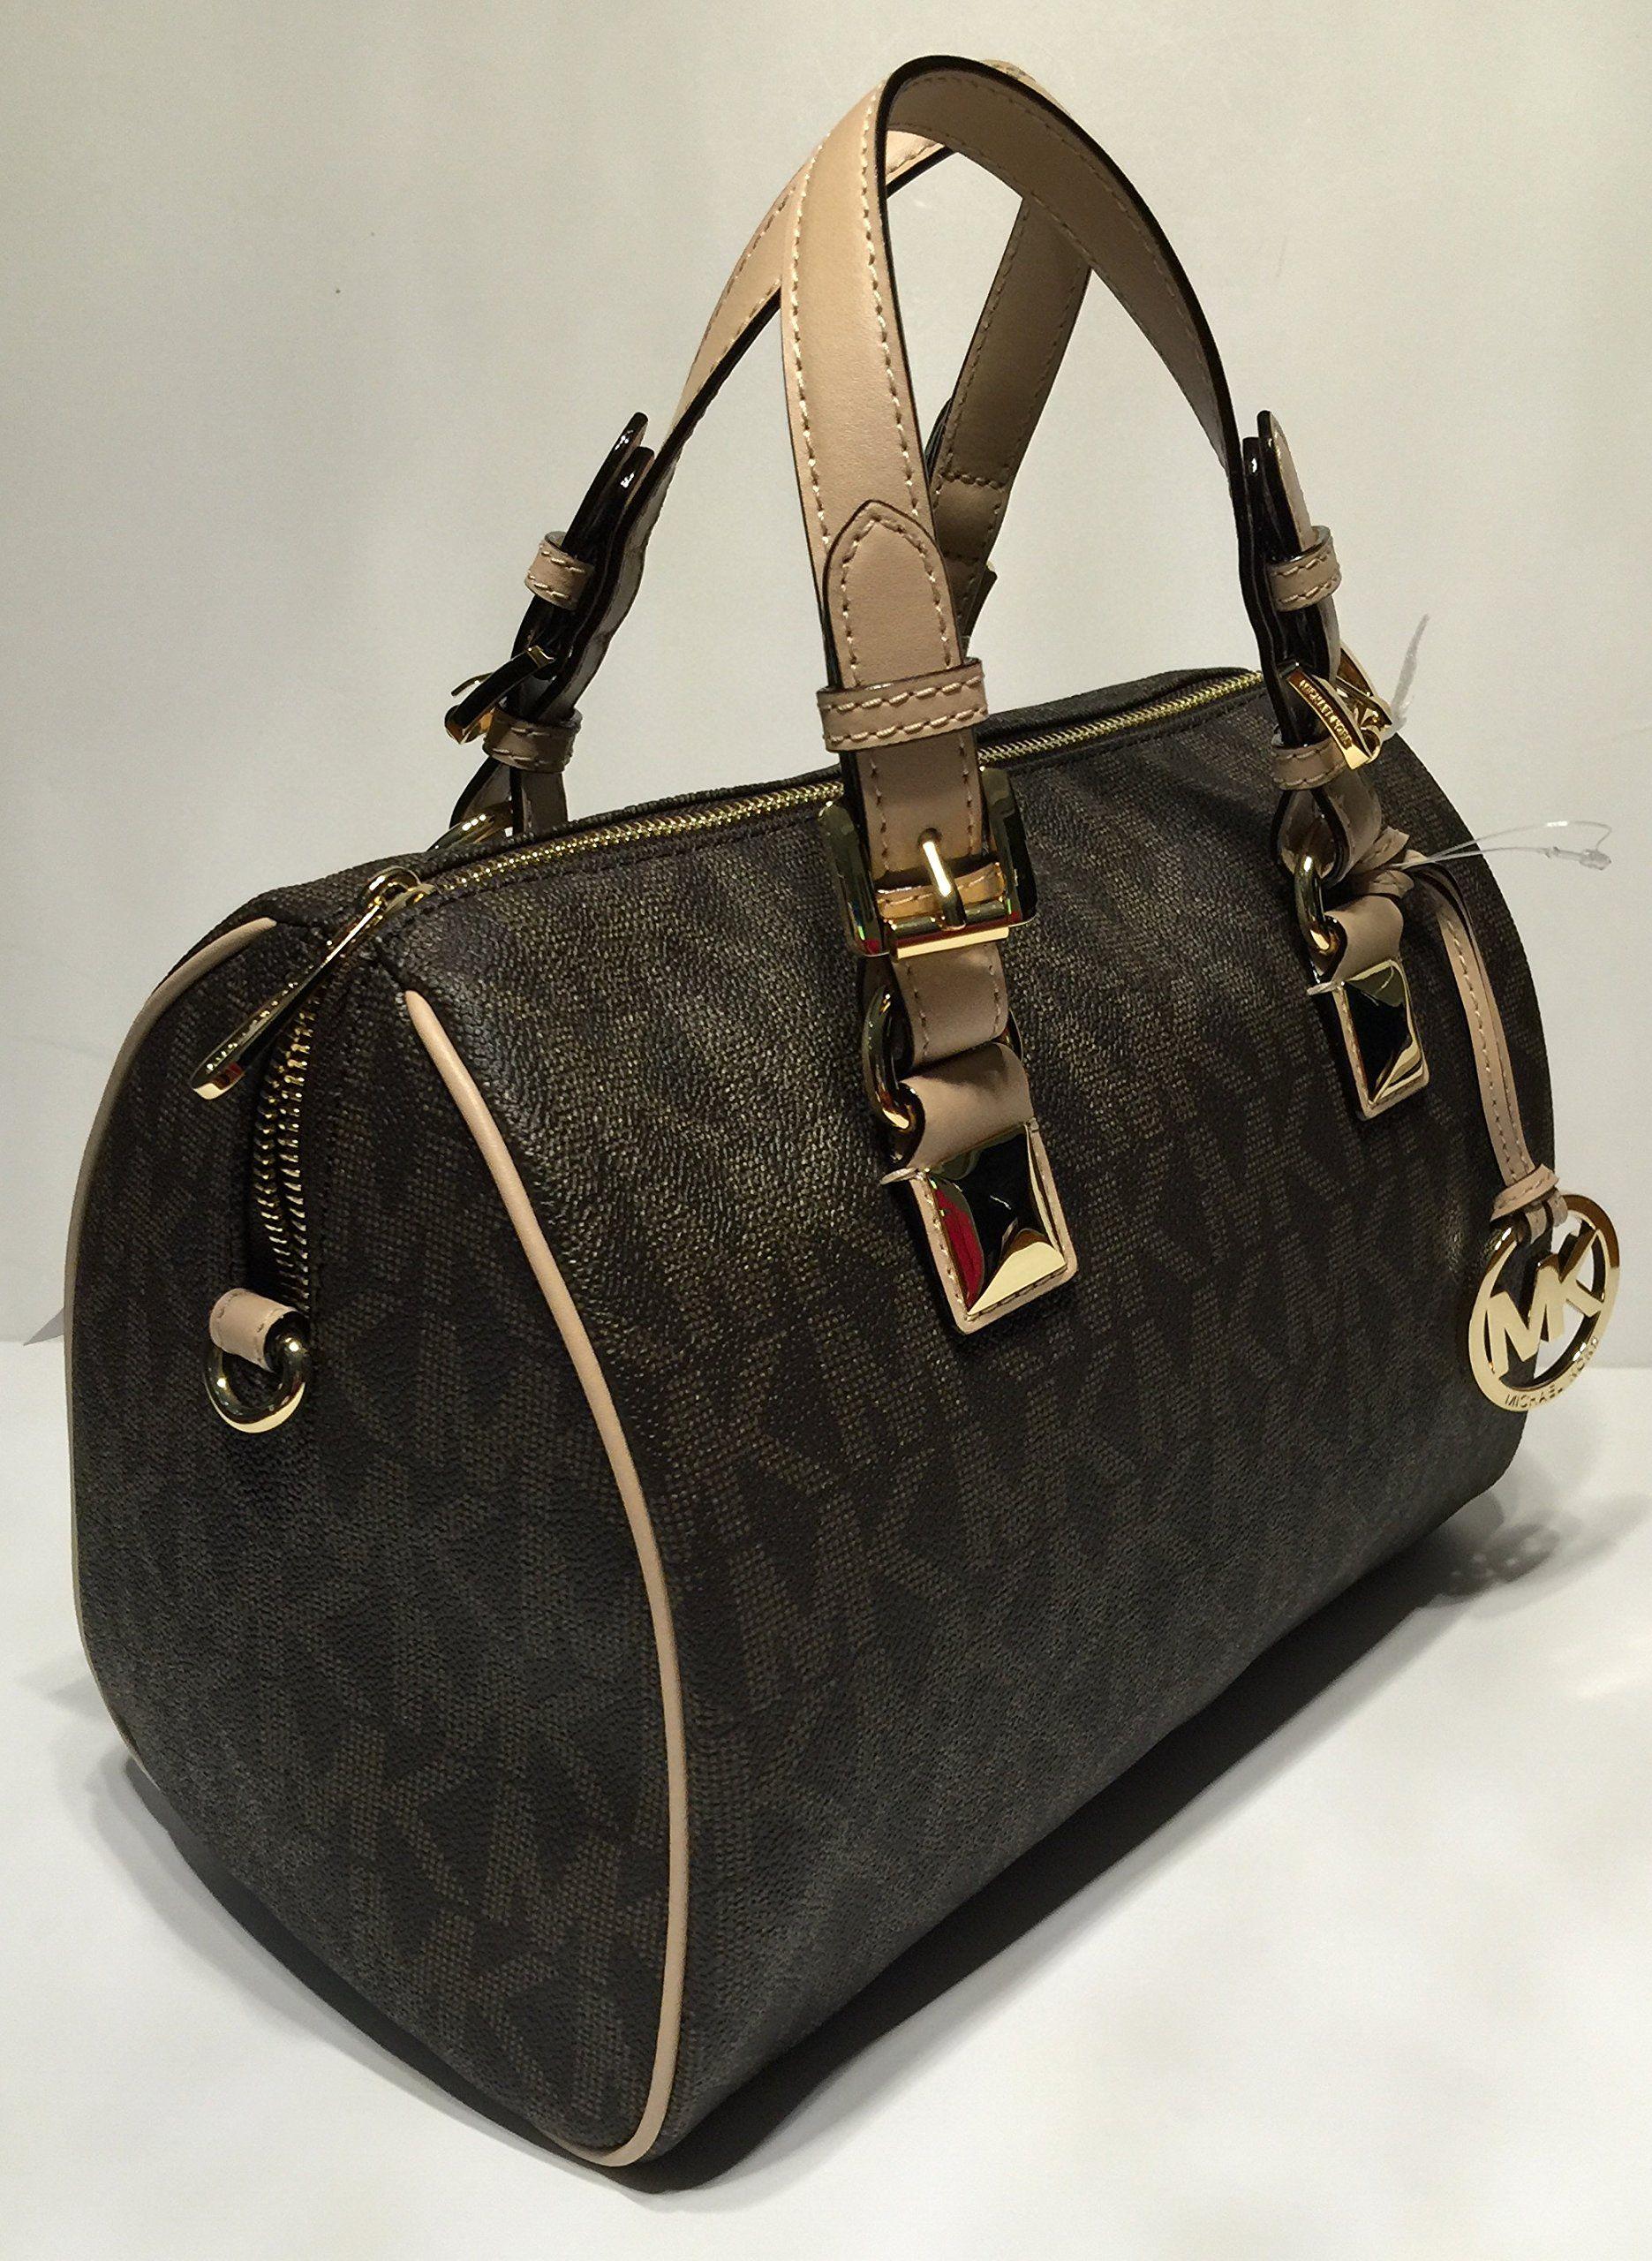 b6d5f855a12b Michael Kors MD Grayson Satchel Handbag Signature MK Brown PVC with ...